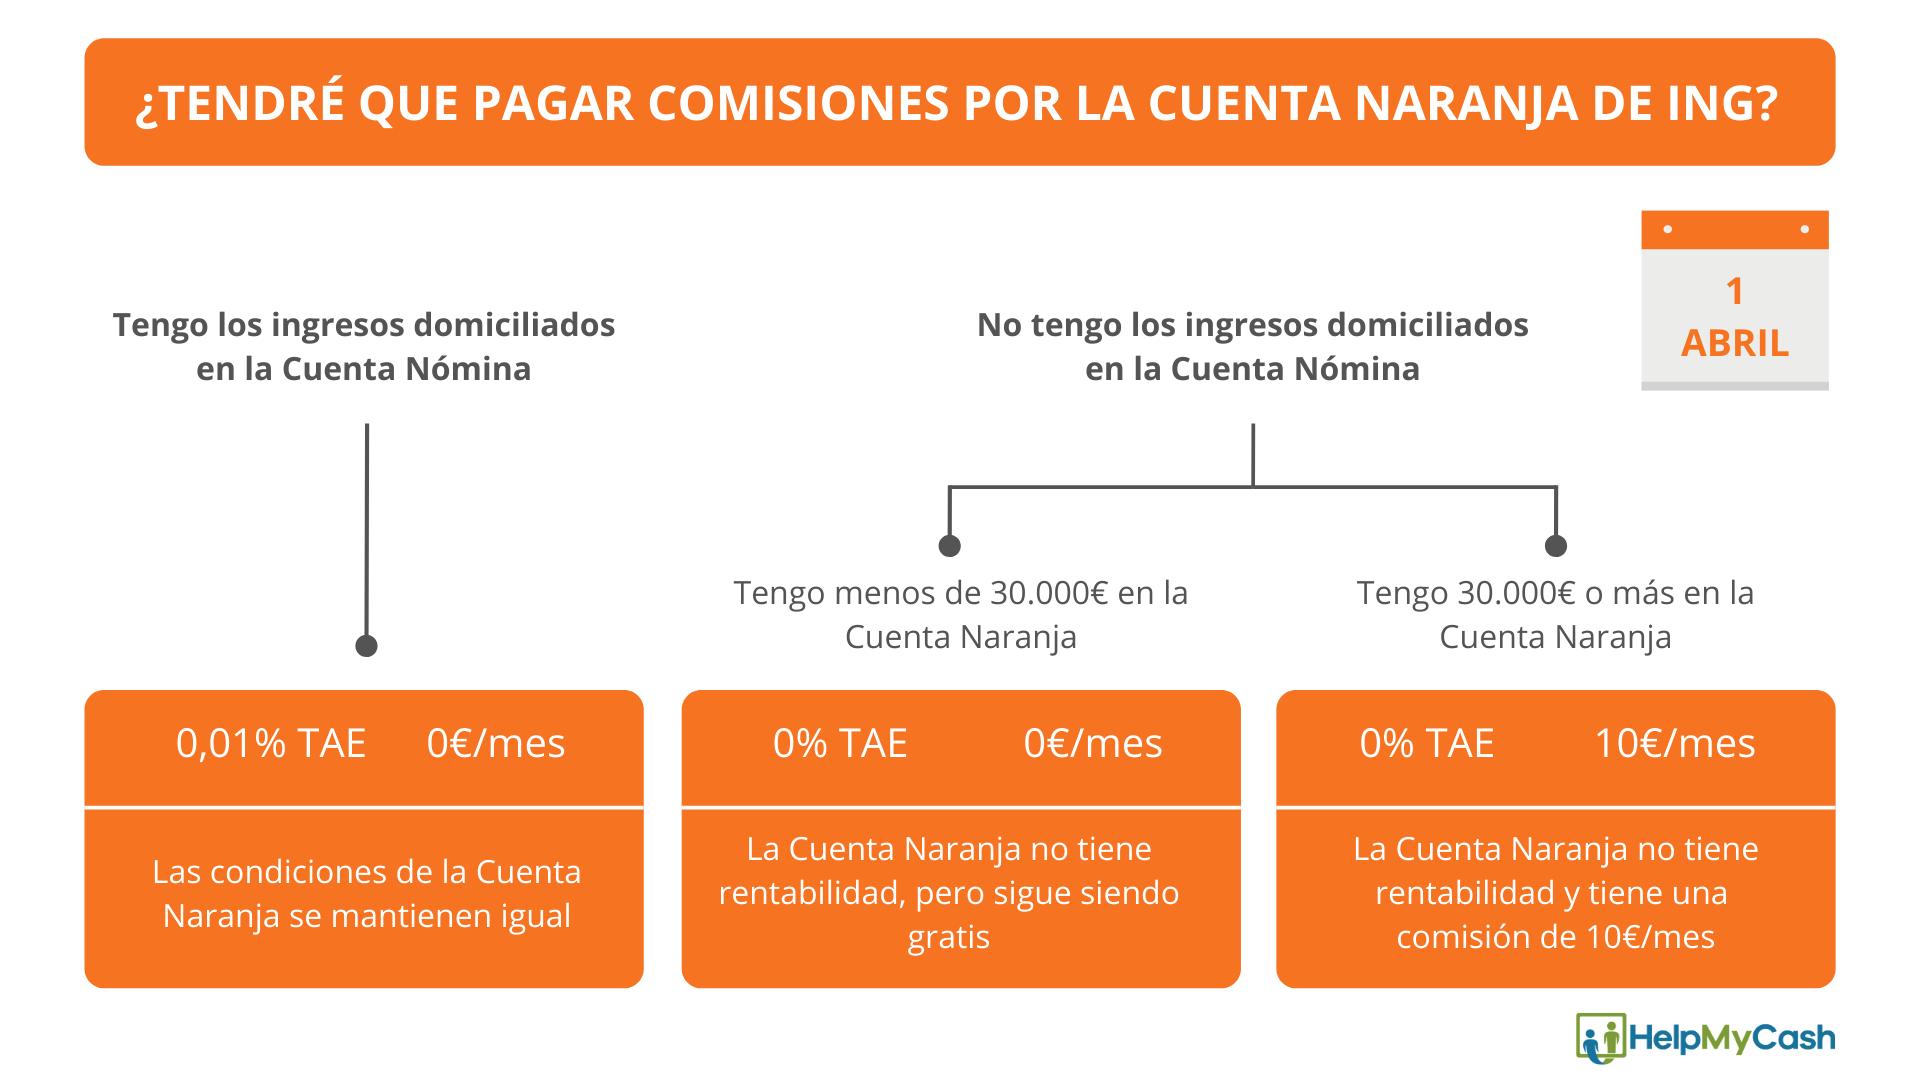 Comisiones cuenta naranja ing